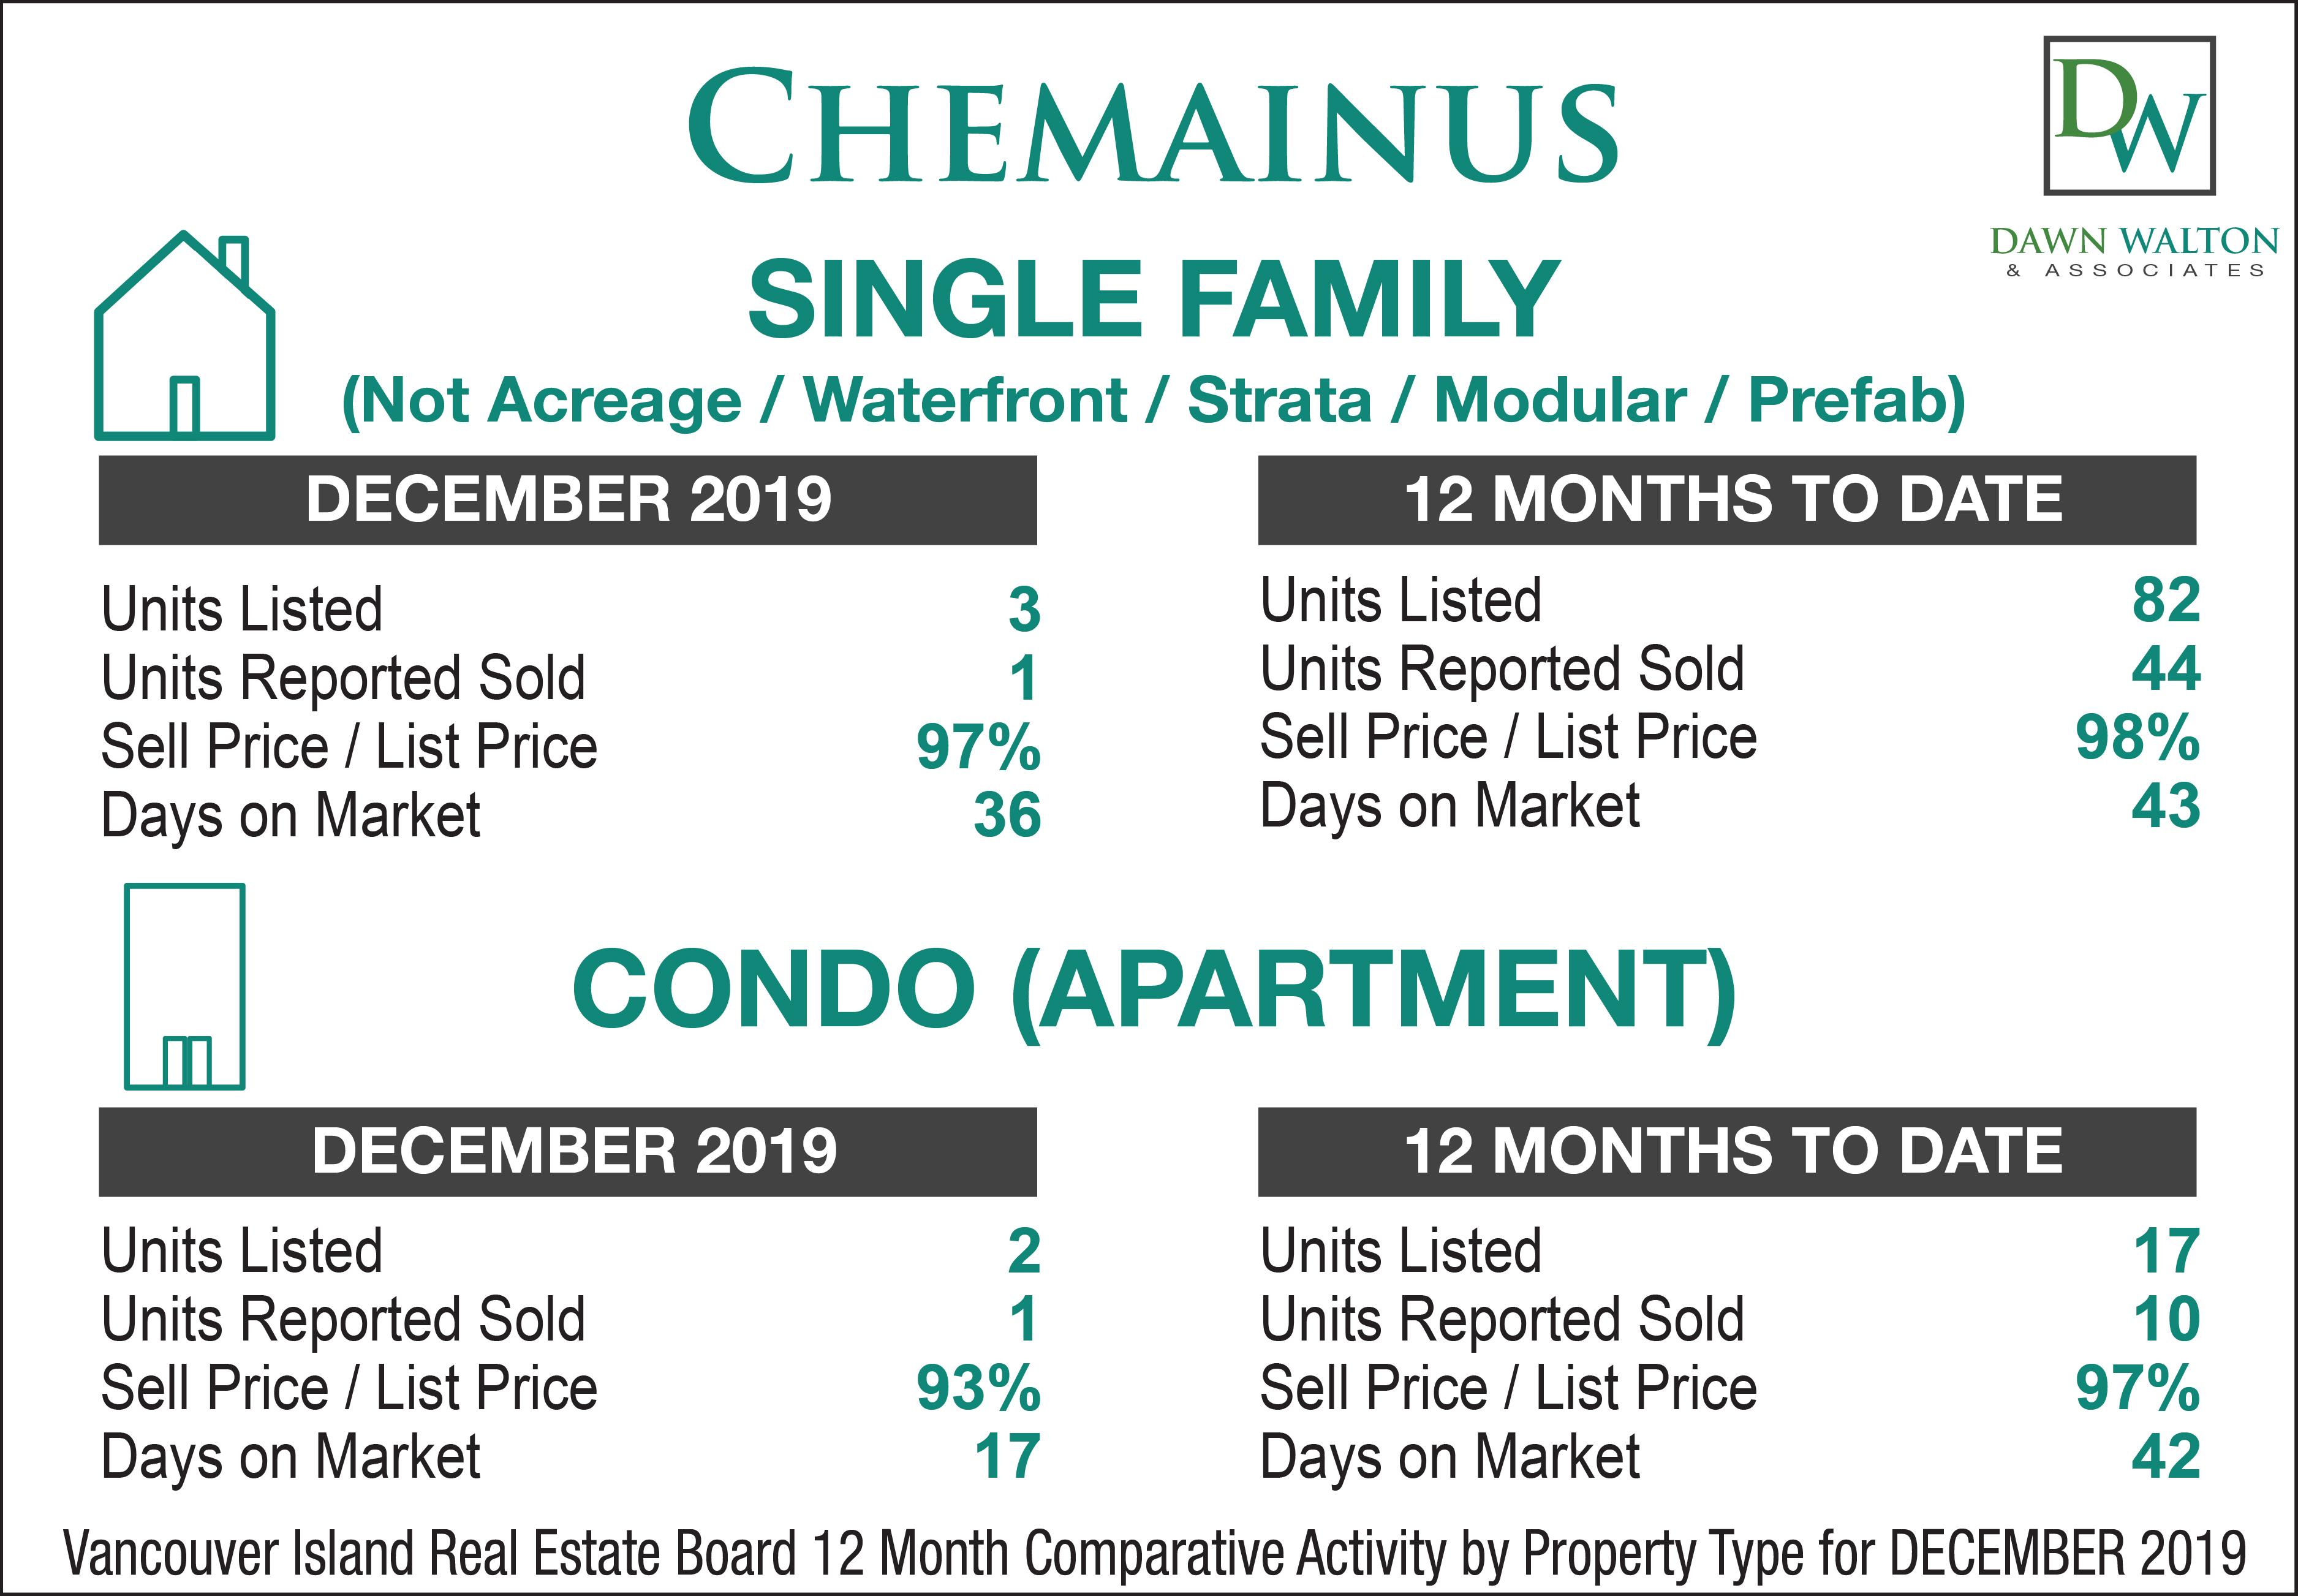 Chemainus Real Estate Market Stats December  2019 - Nanaimo Realtor Dawn Walton